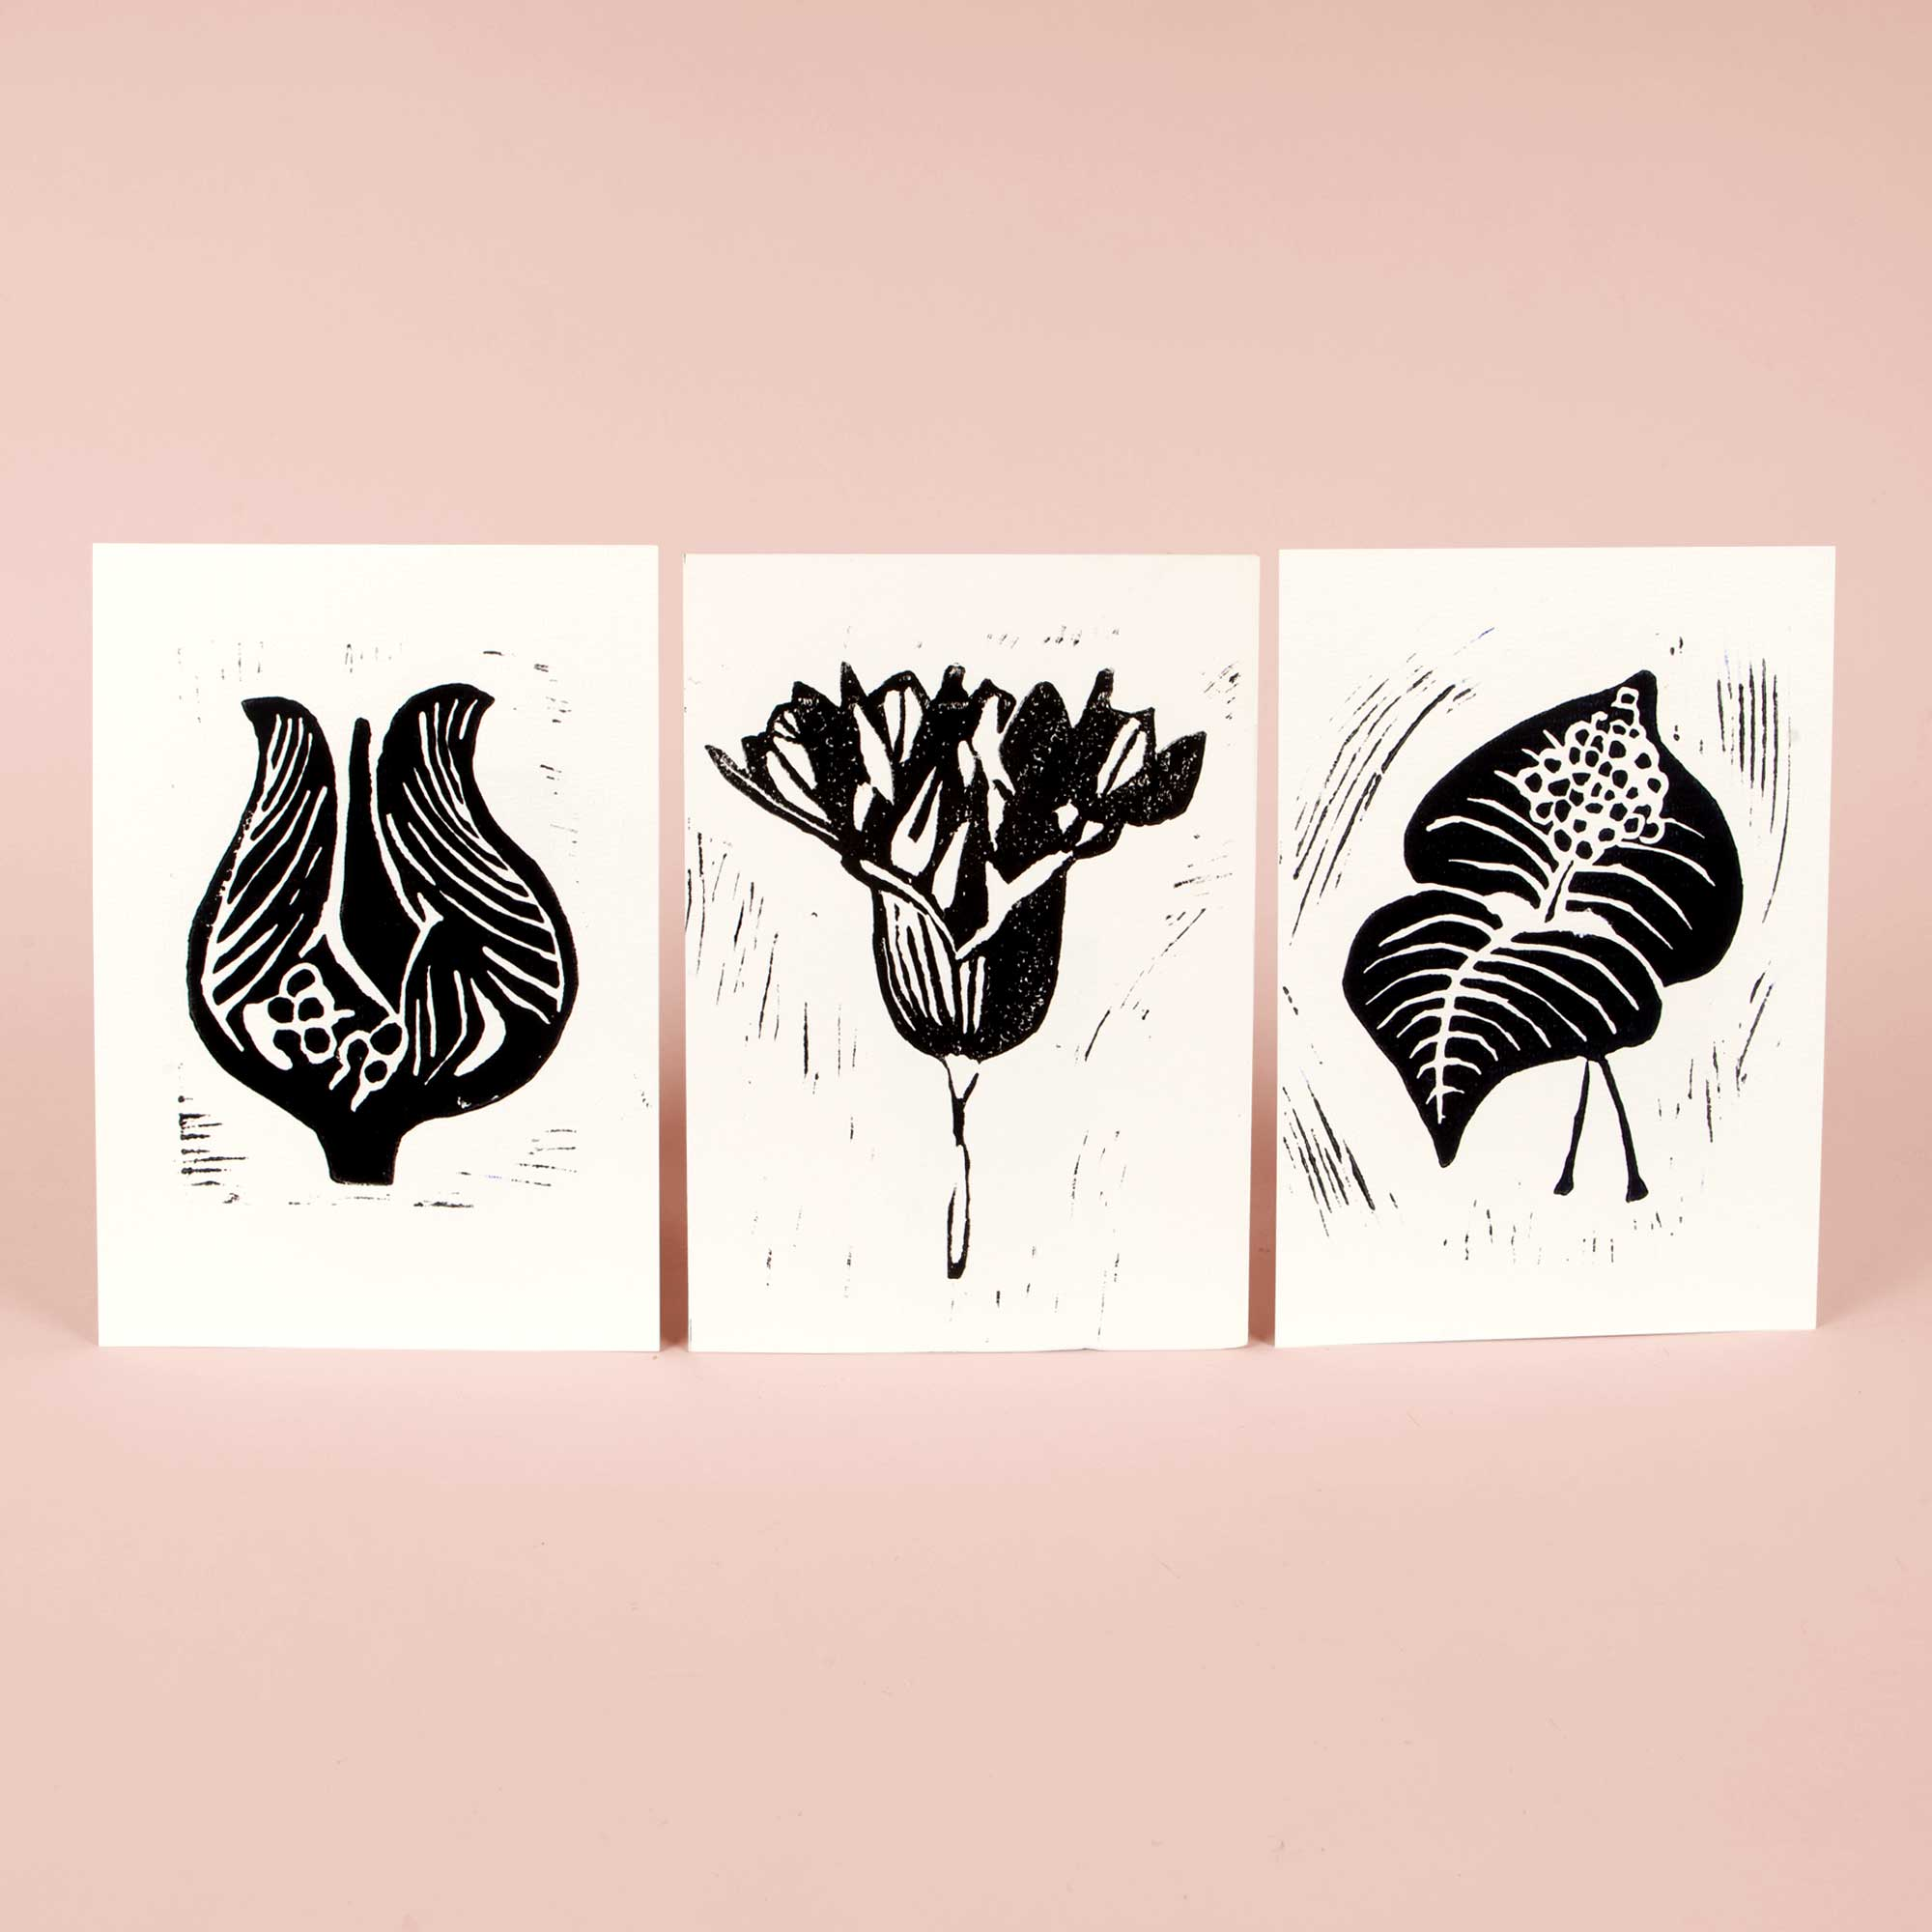 Hand printed linocut greeting cards - black series